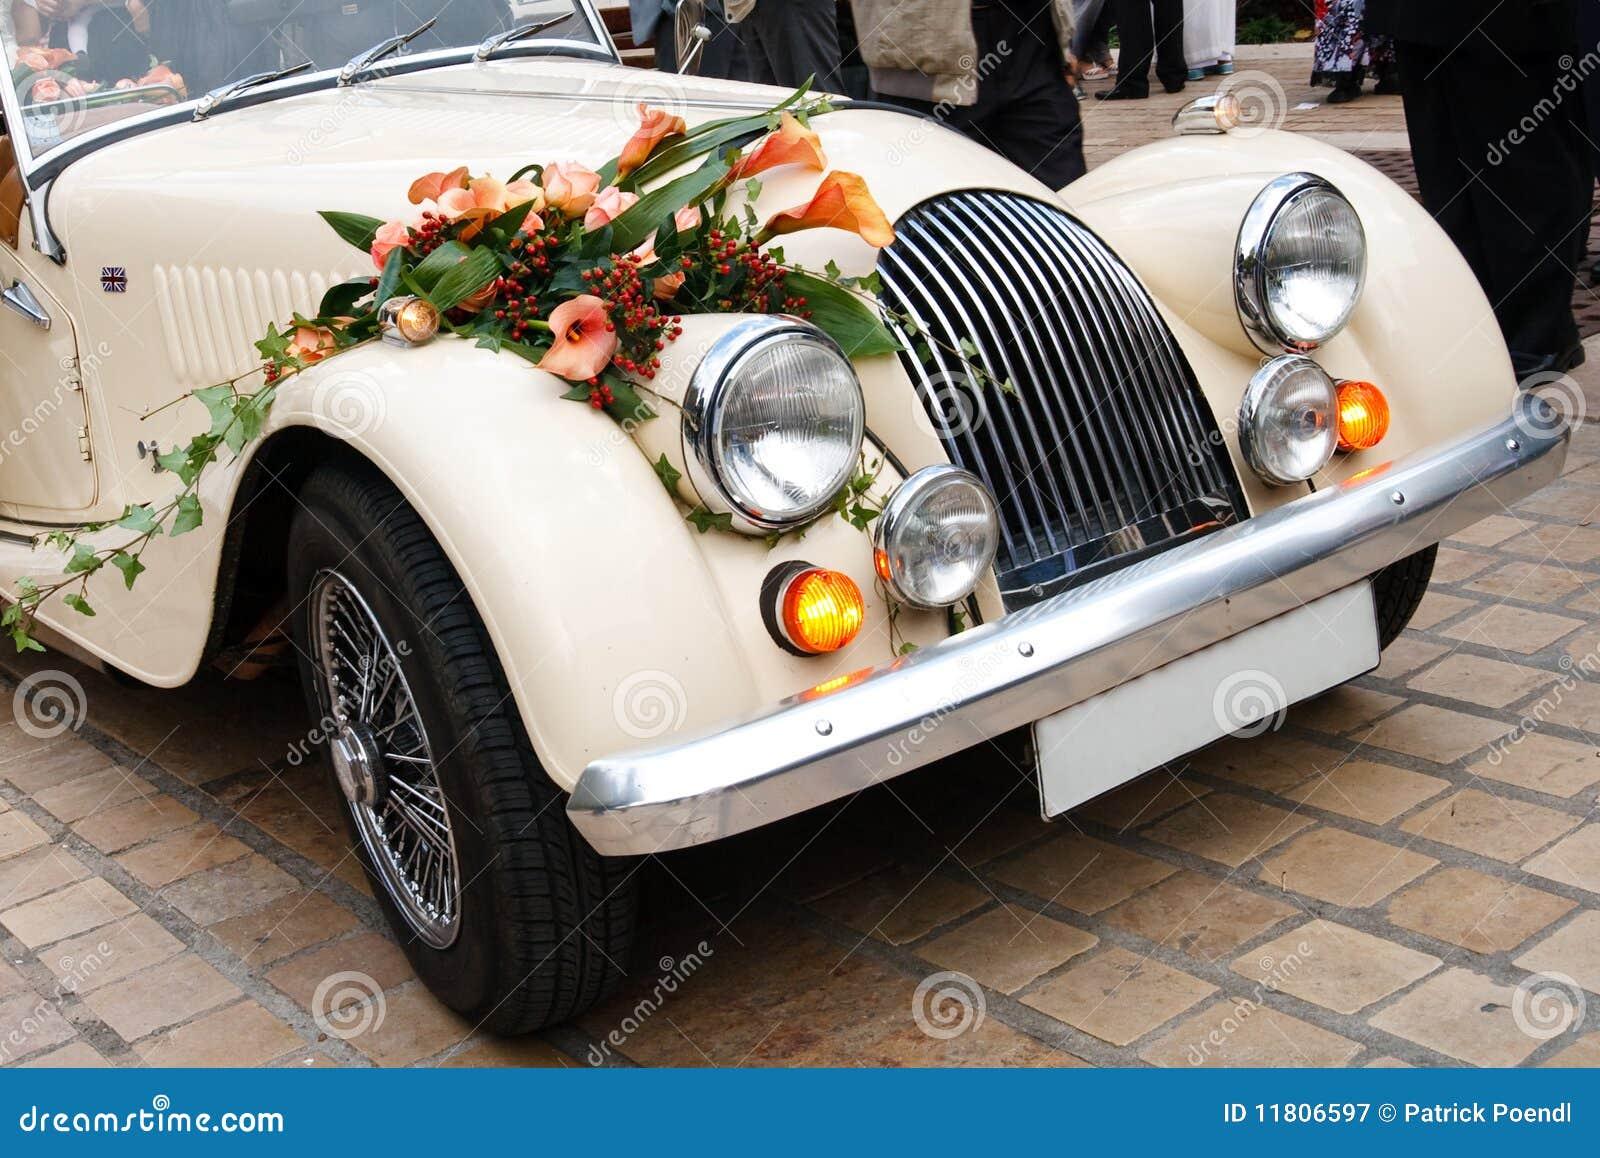 Indian Wedding Car Flower Decorations Comousar